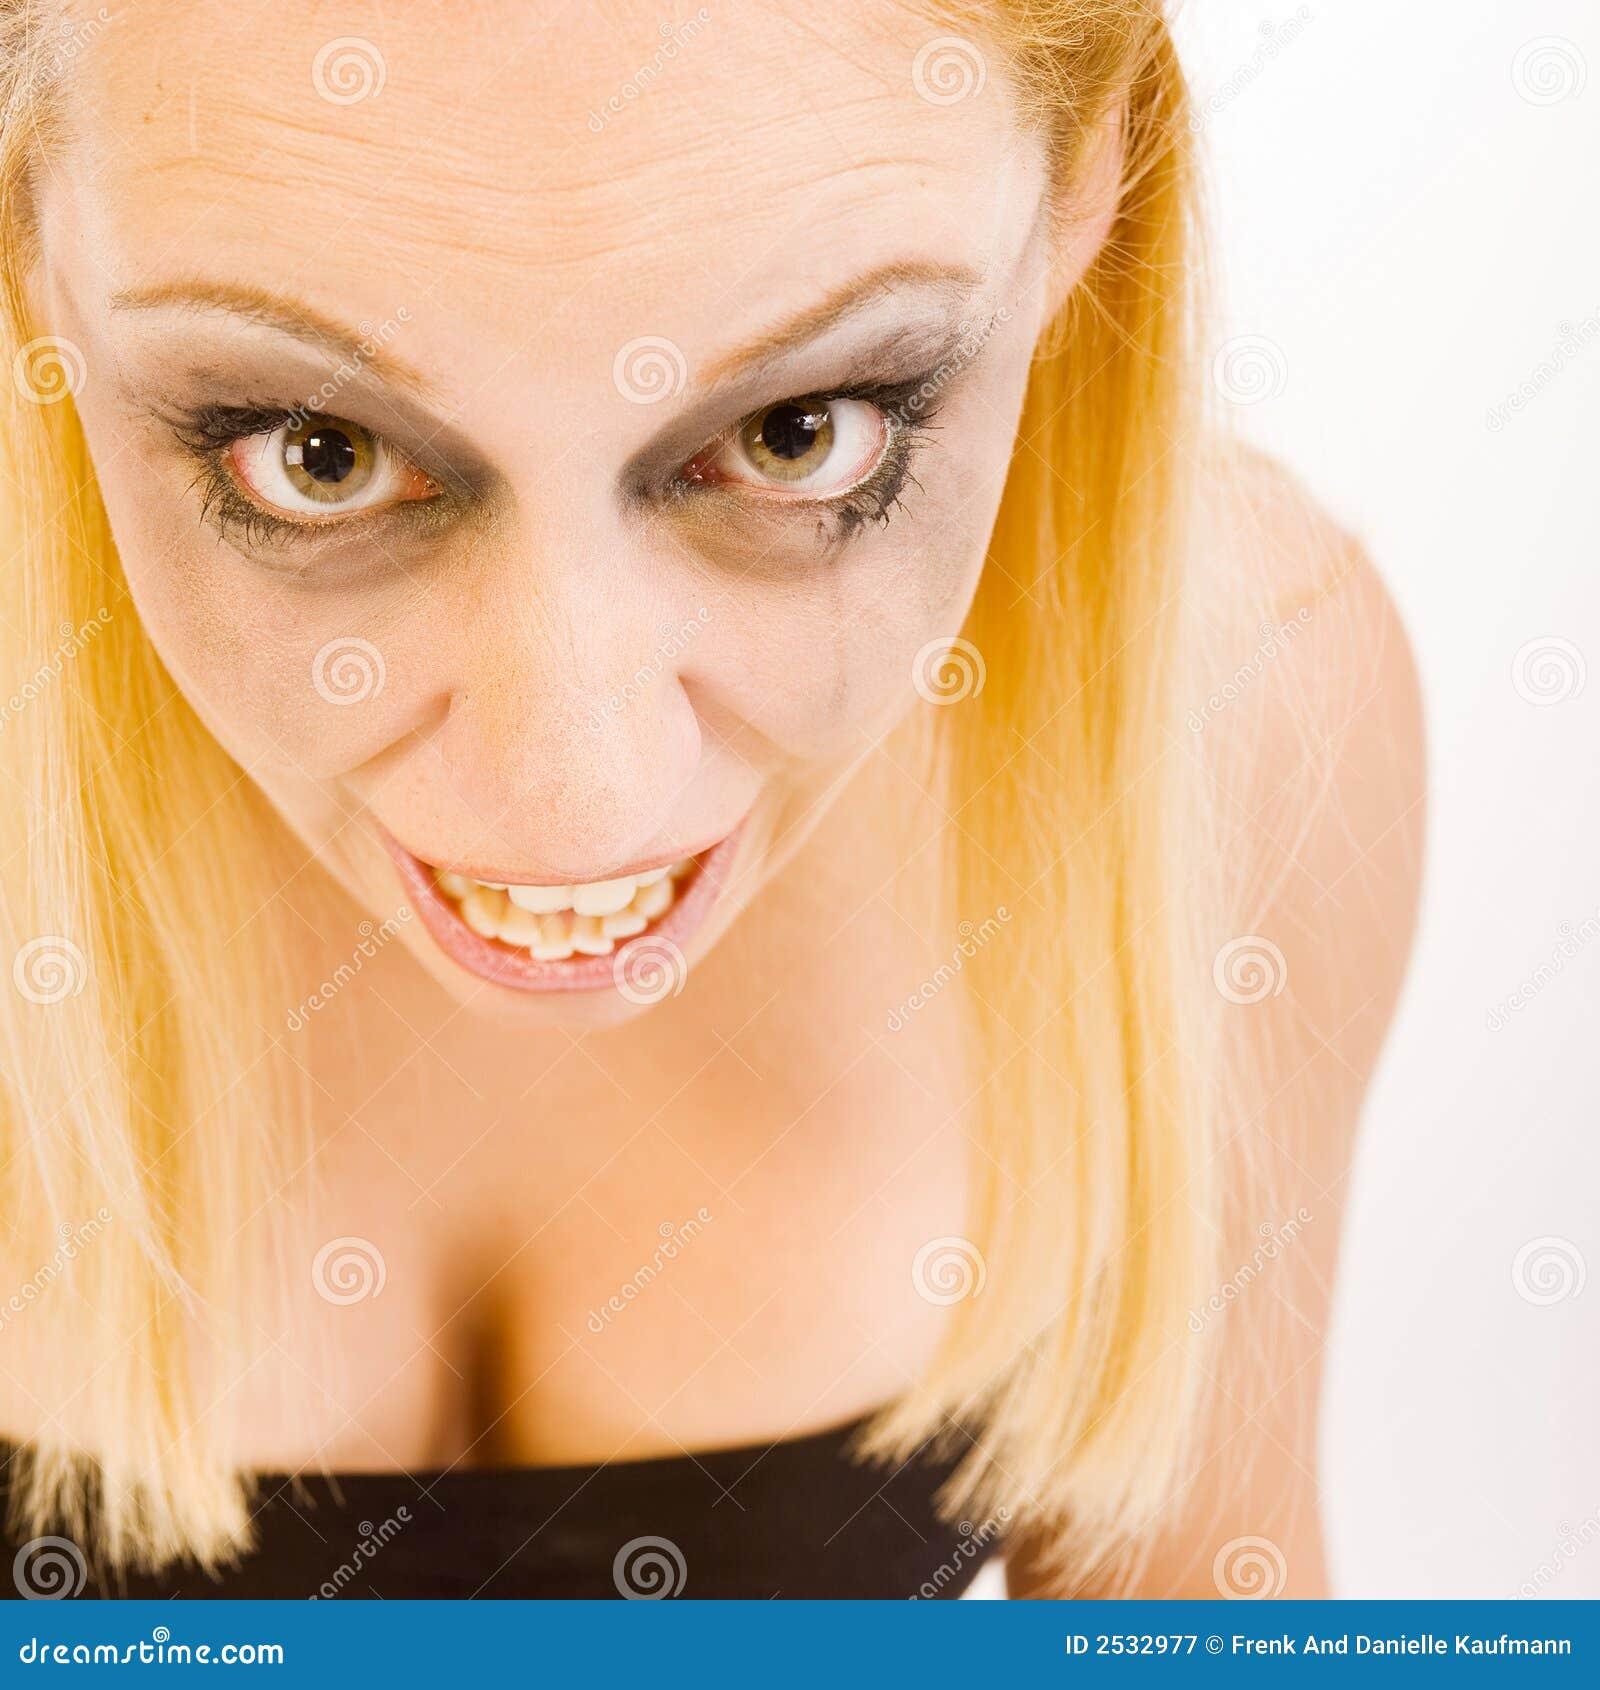 Kelly madison tits